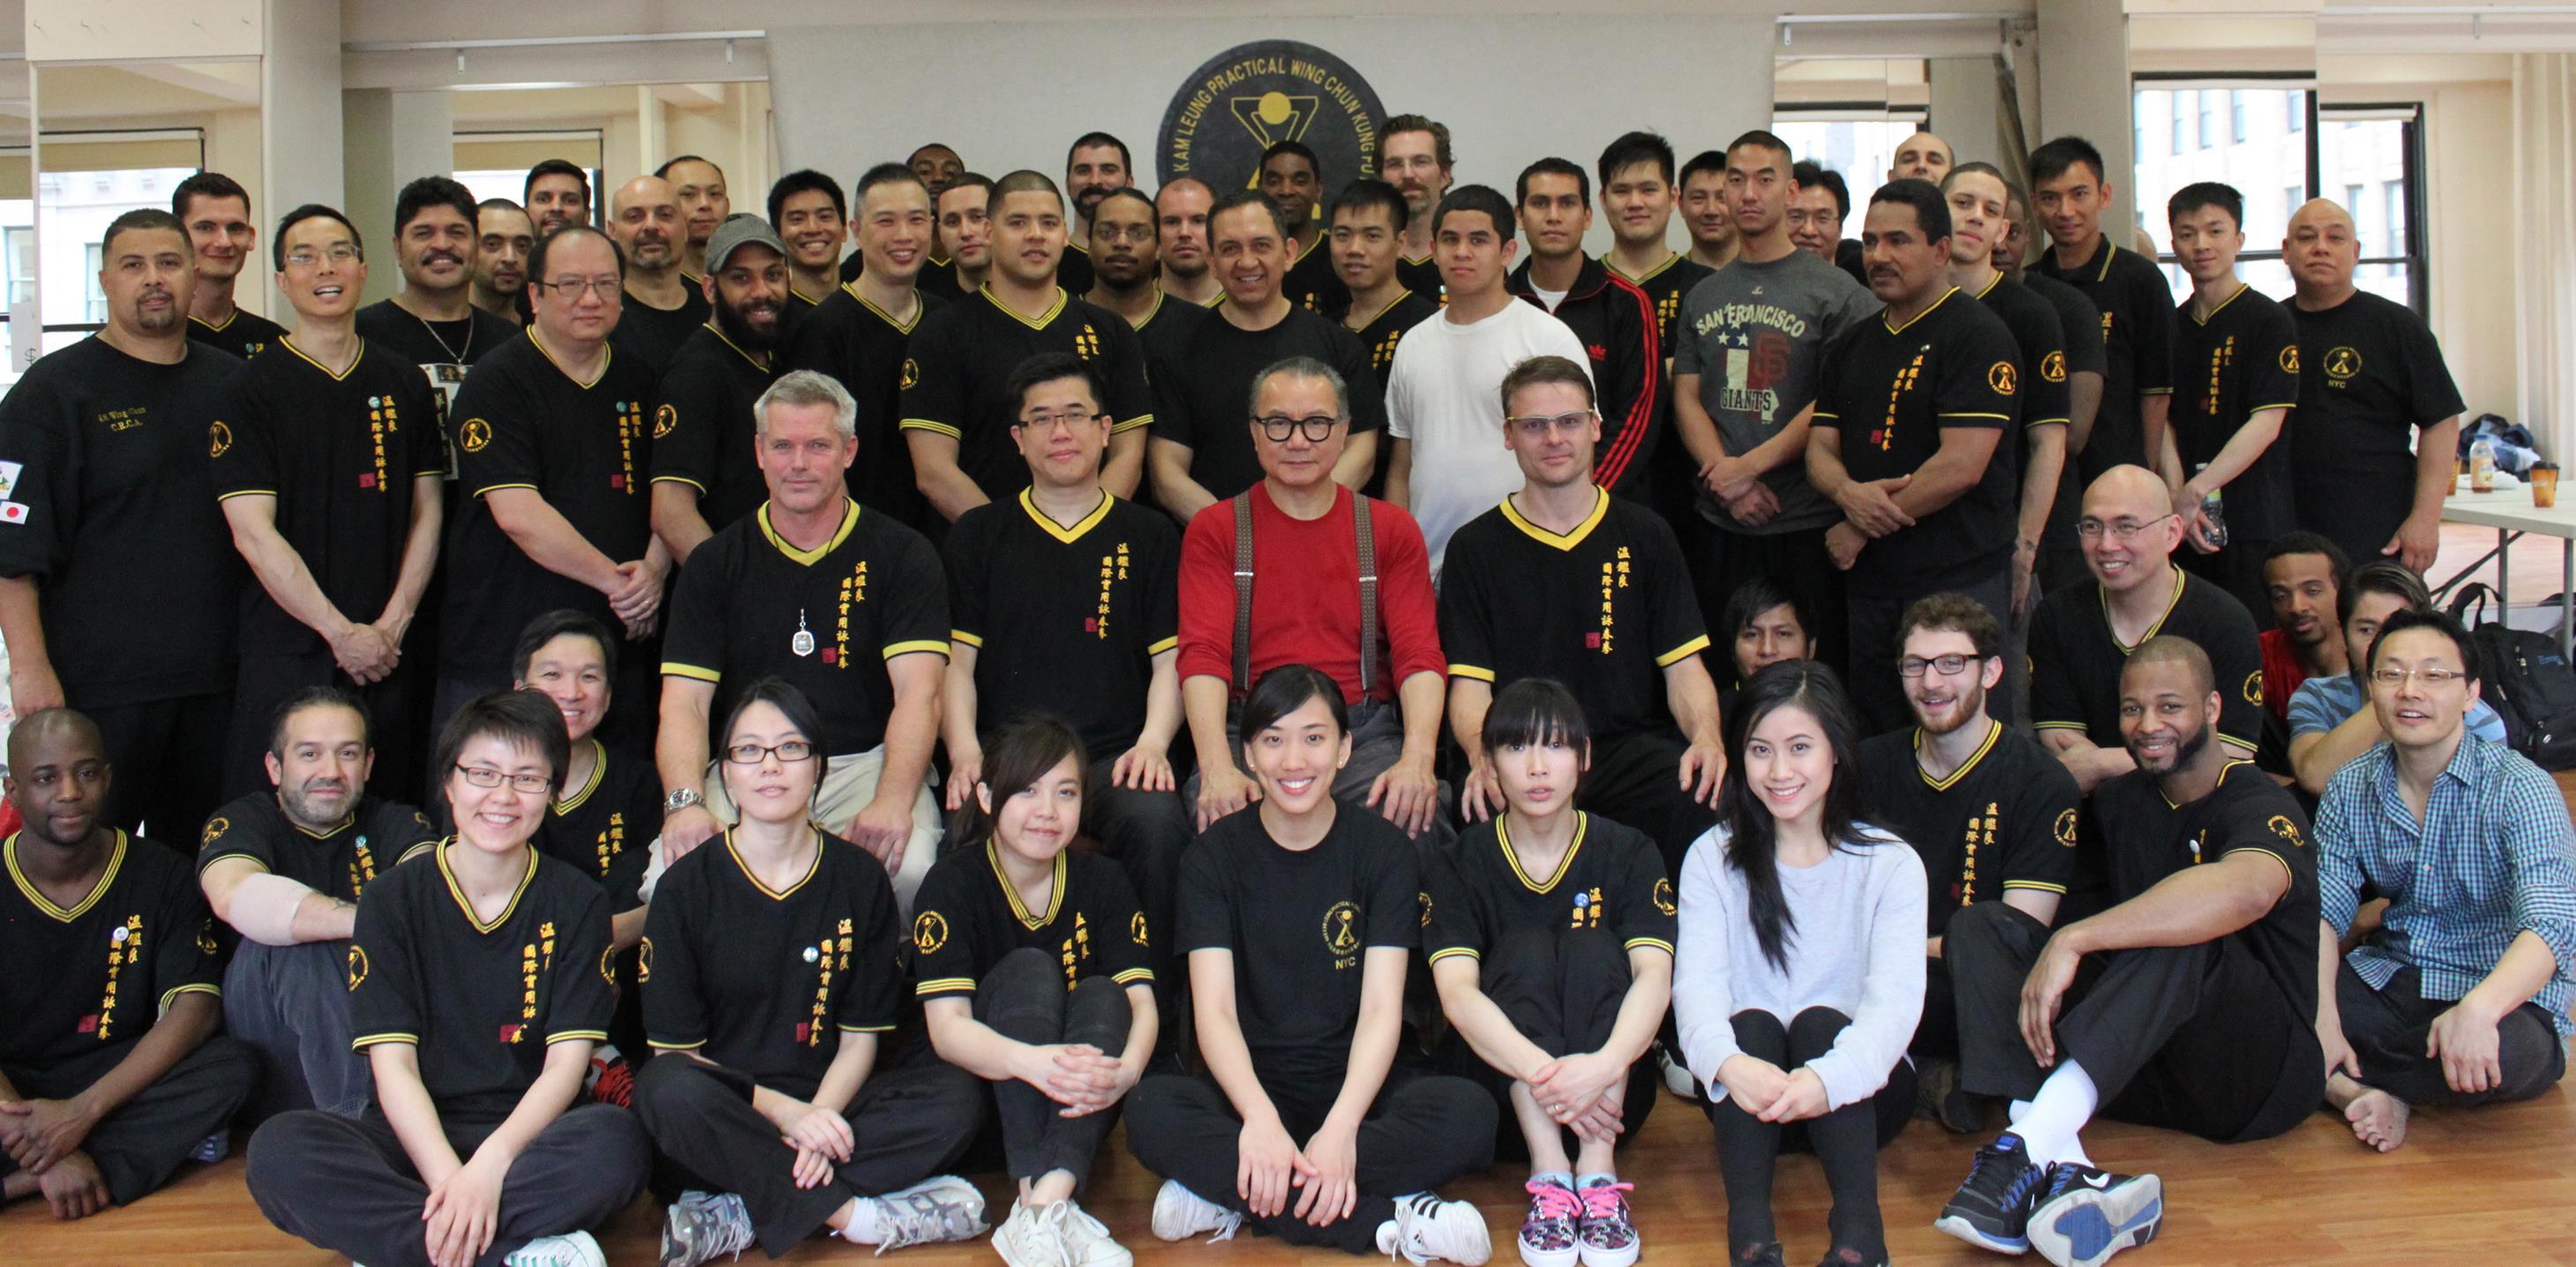 Wan Kam Leung: Chinese martial artist - Biography, Life, Family